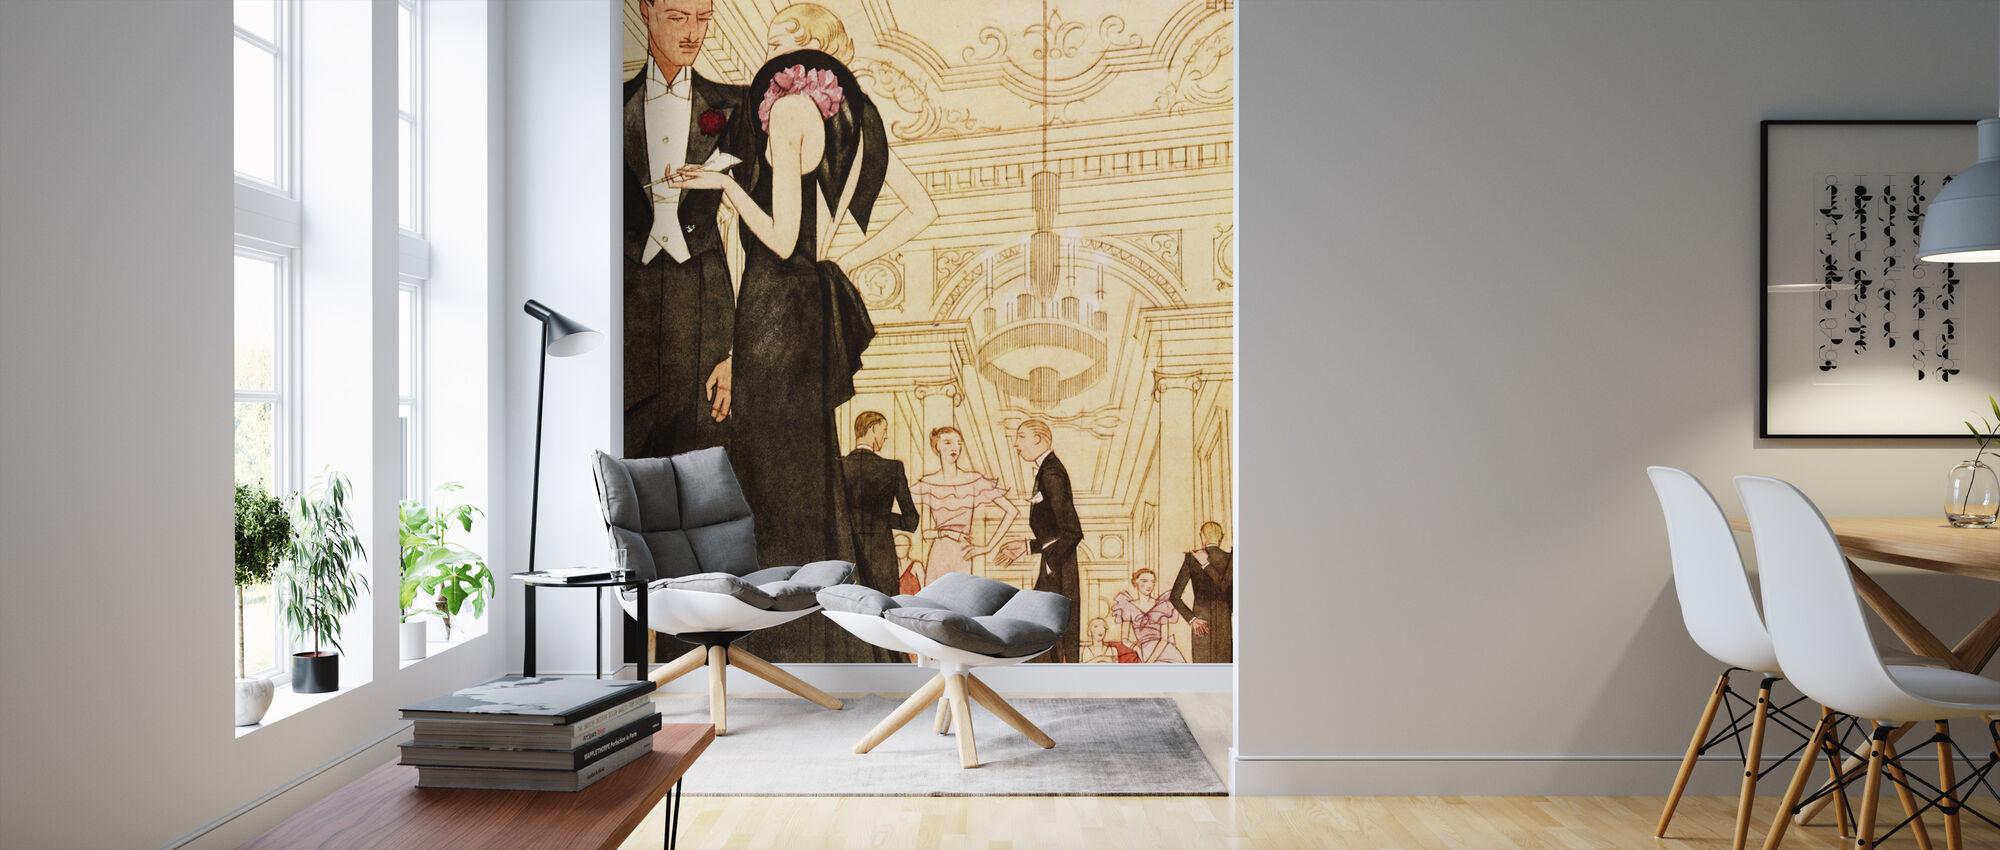 Evening Scene, National Magazines - Wallpaper - Living Room